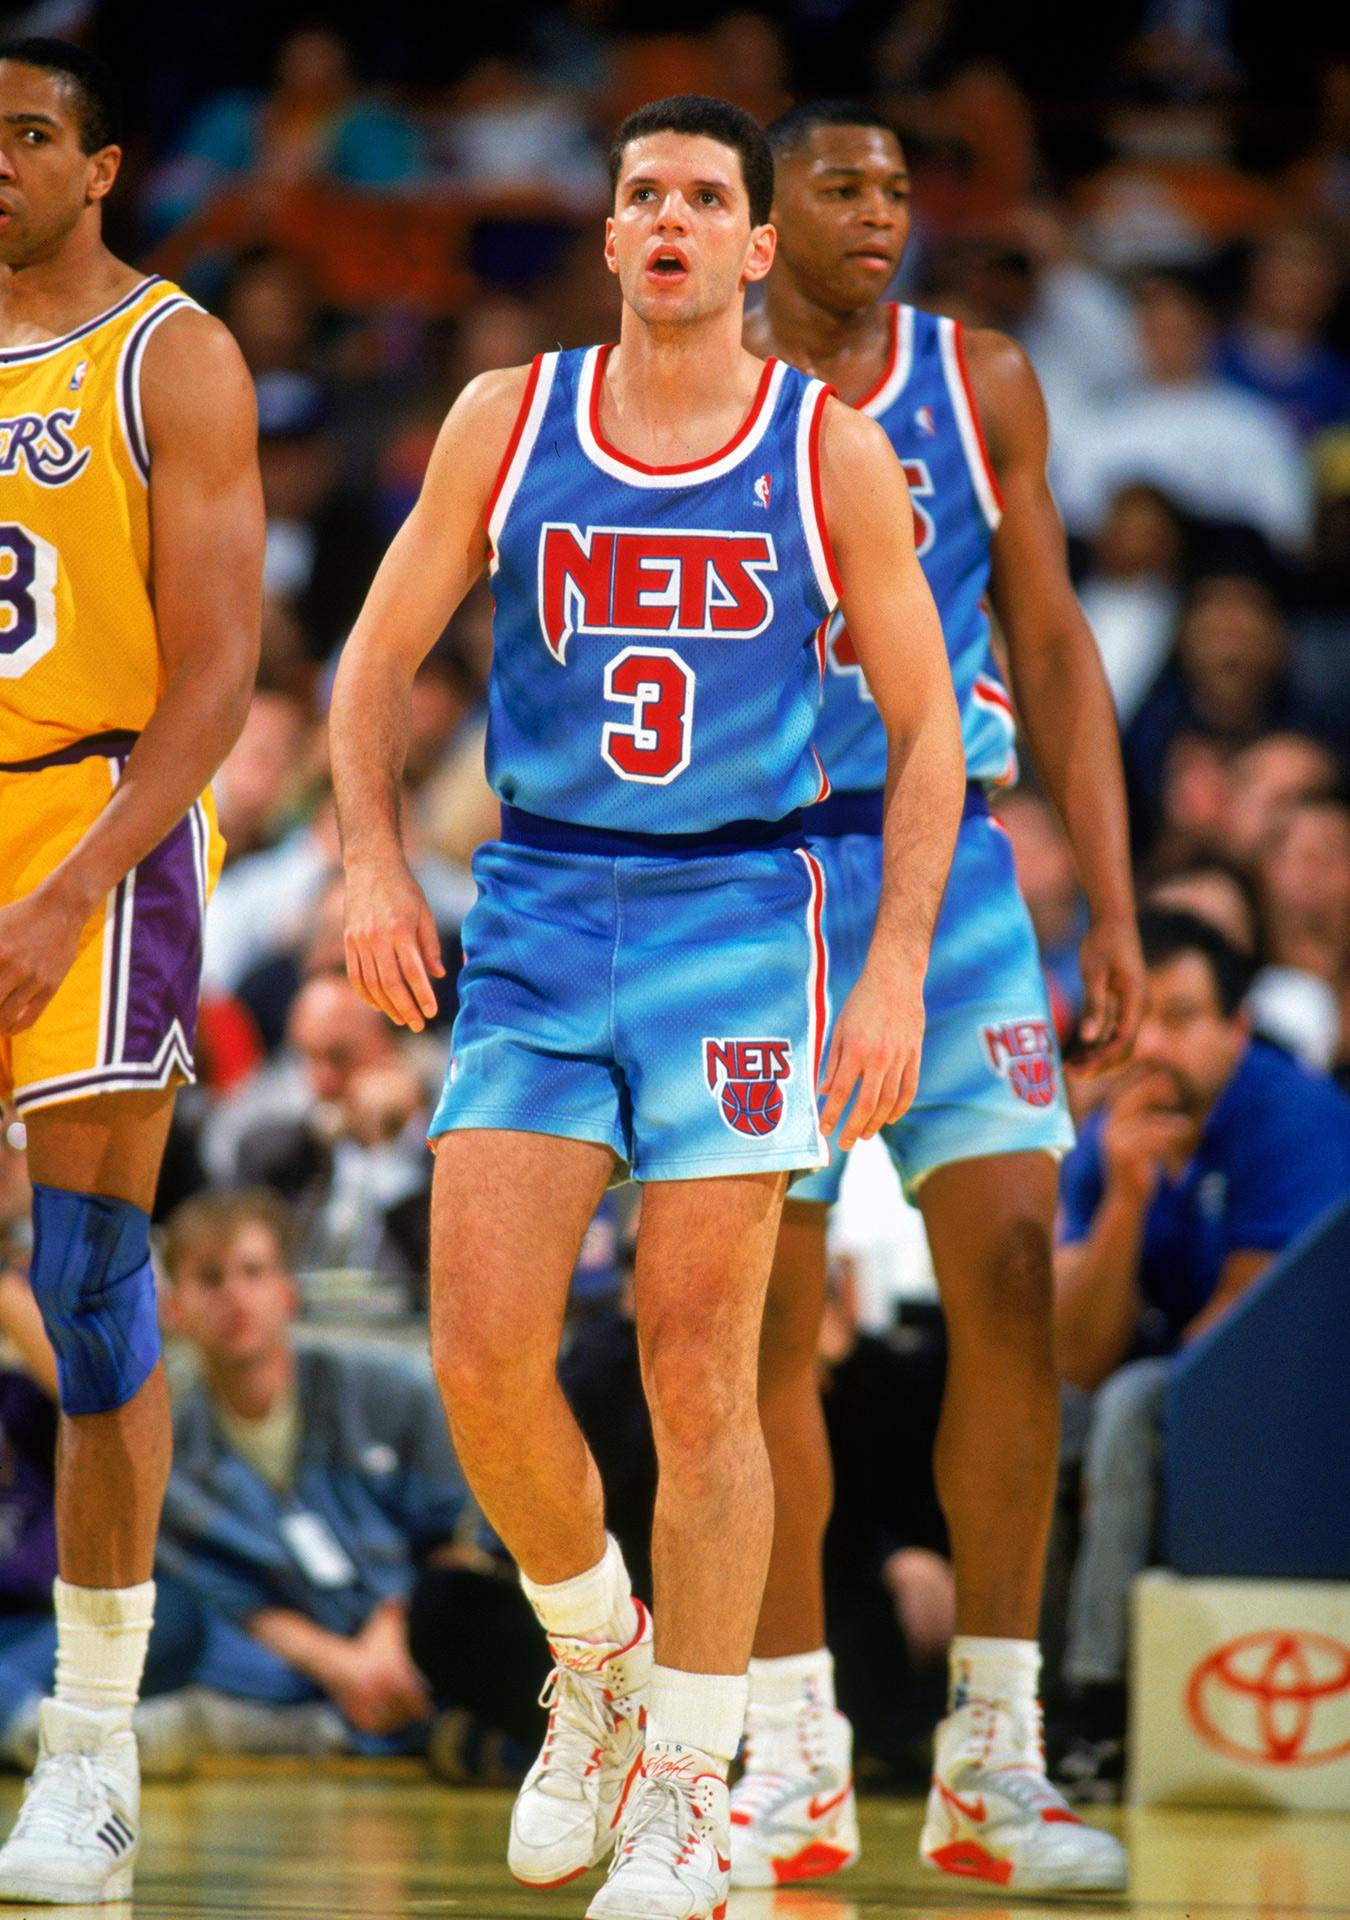 c50c16e107c Evolution of the NBA Uniform - ESPN